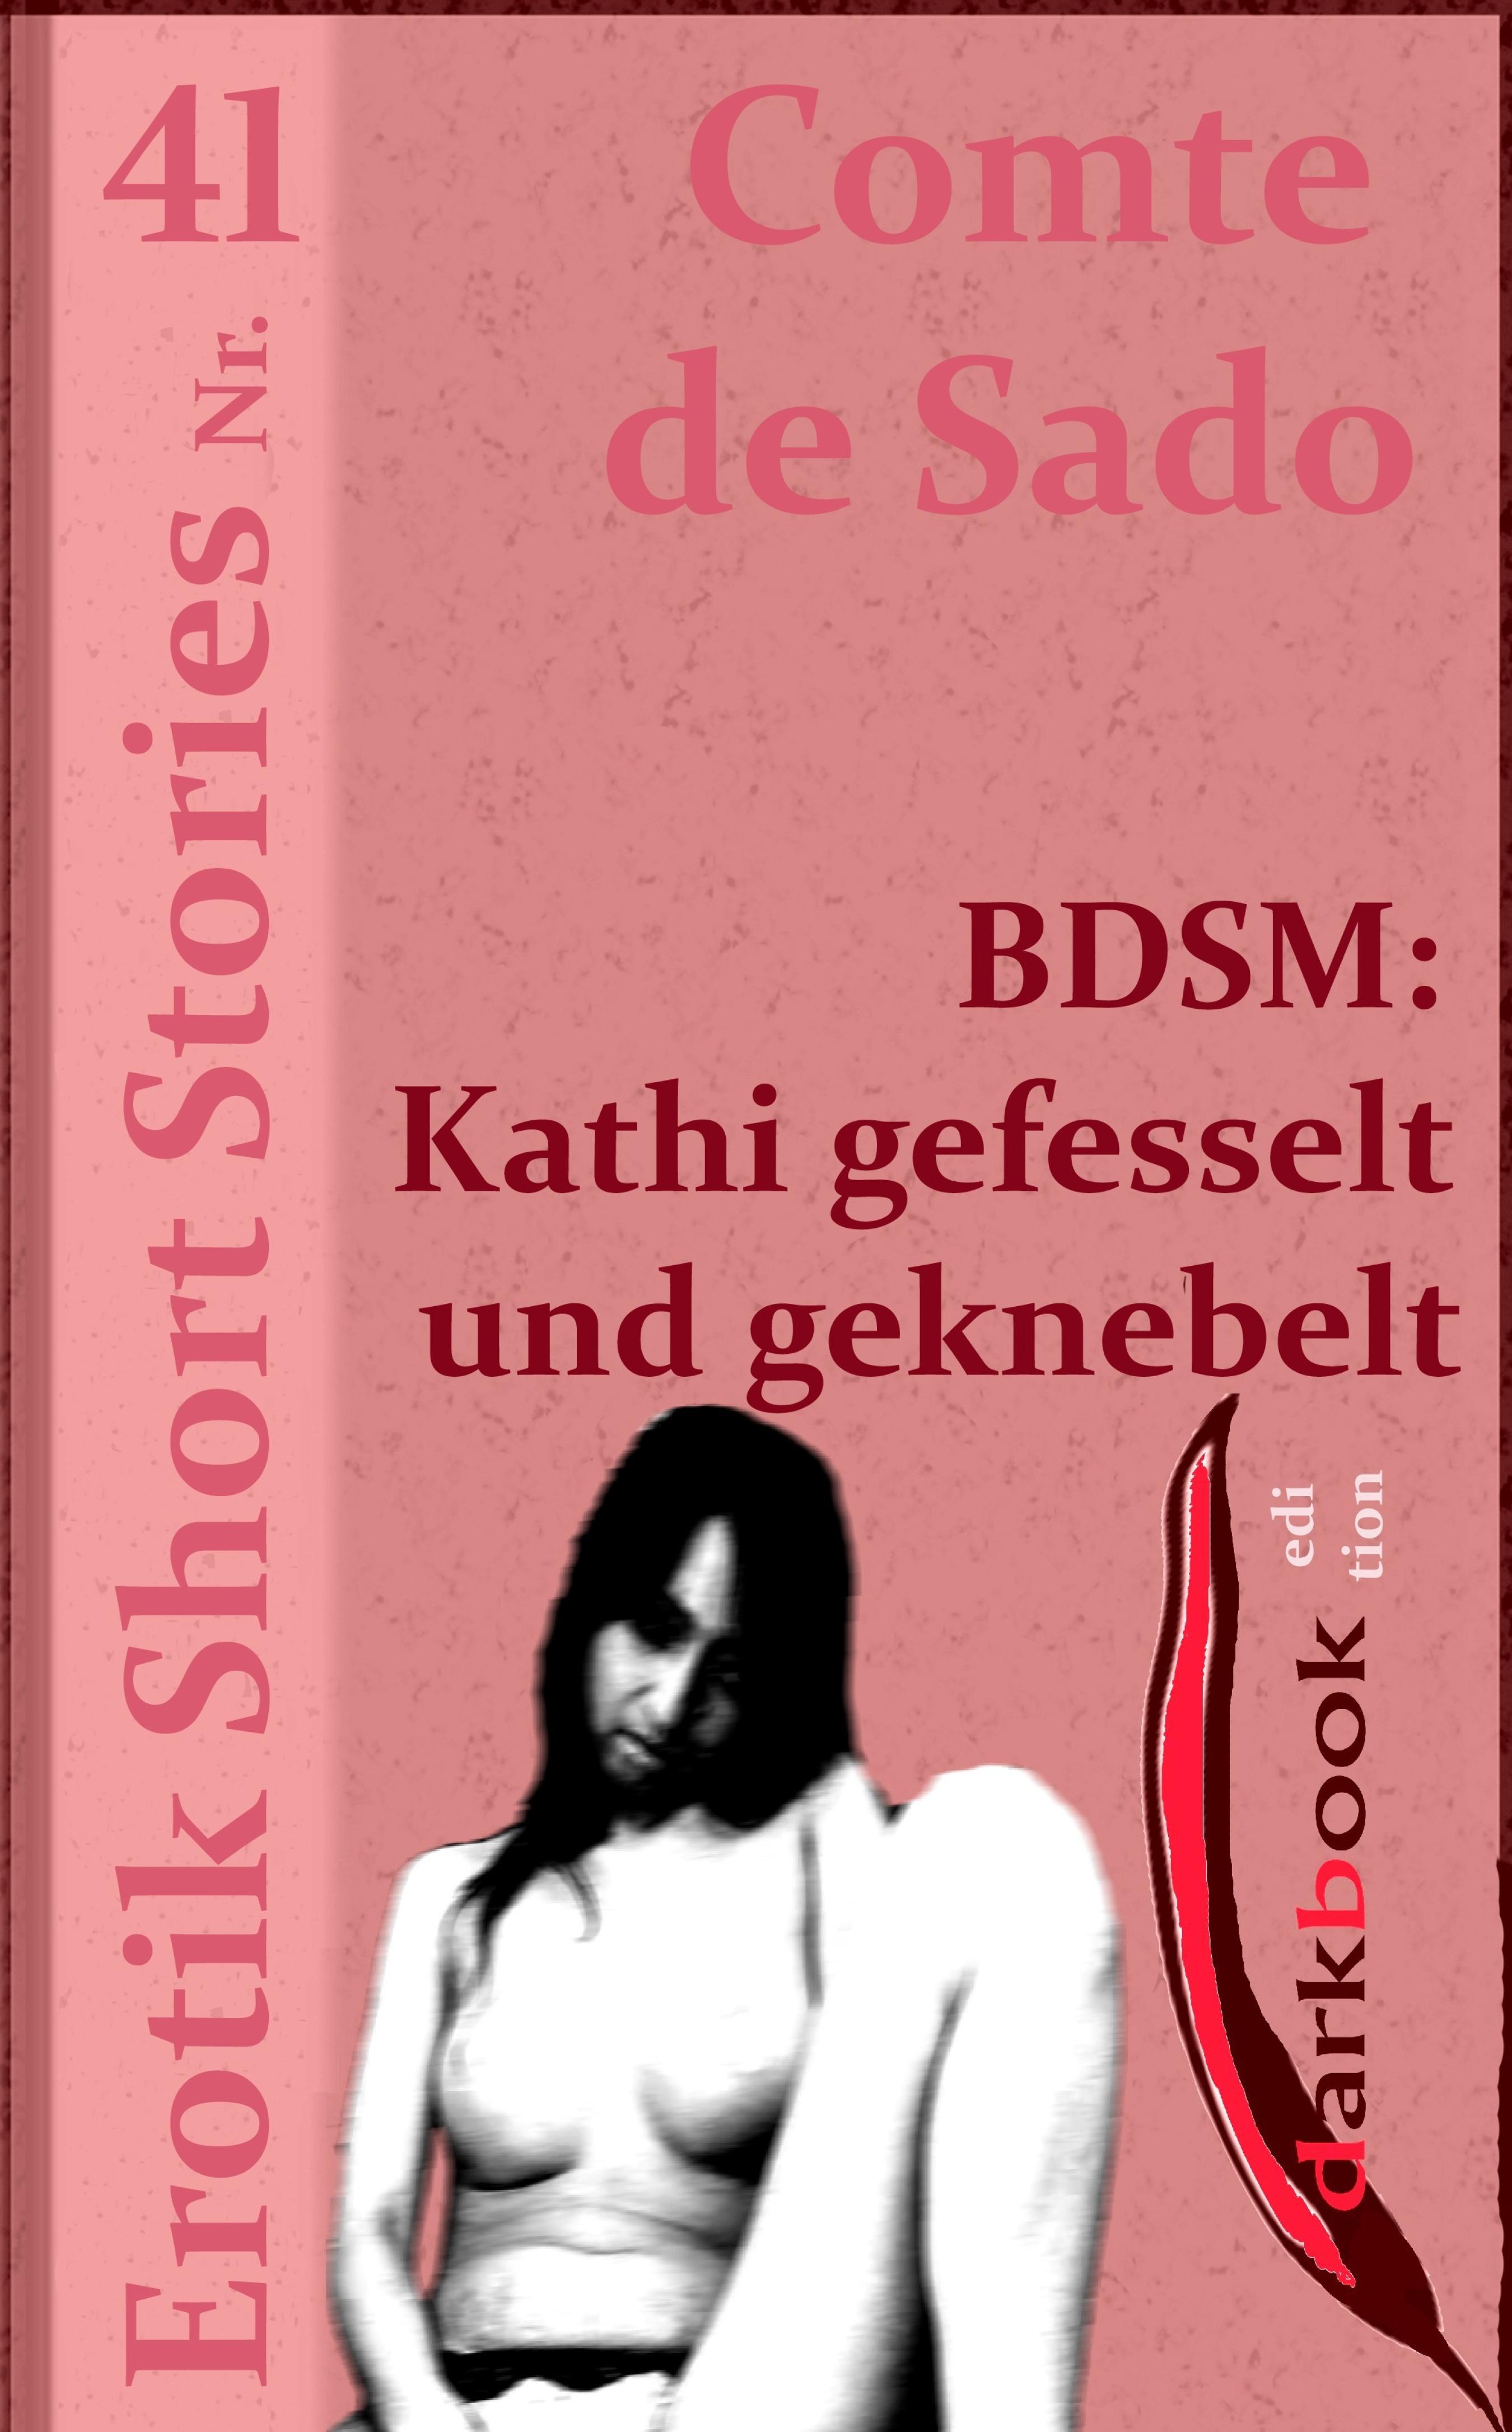 Comte de Sado BDSM: Kathi gefesselt und geknebelt comte de sado bdsm rosi weiß was jünglinge brauchen